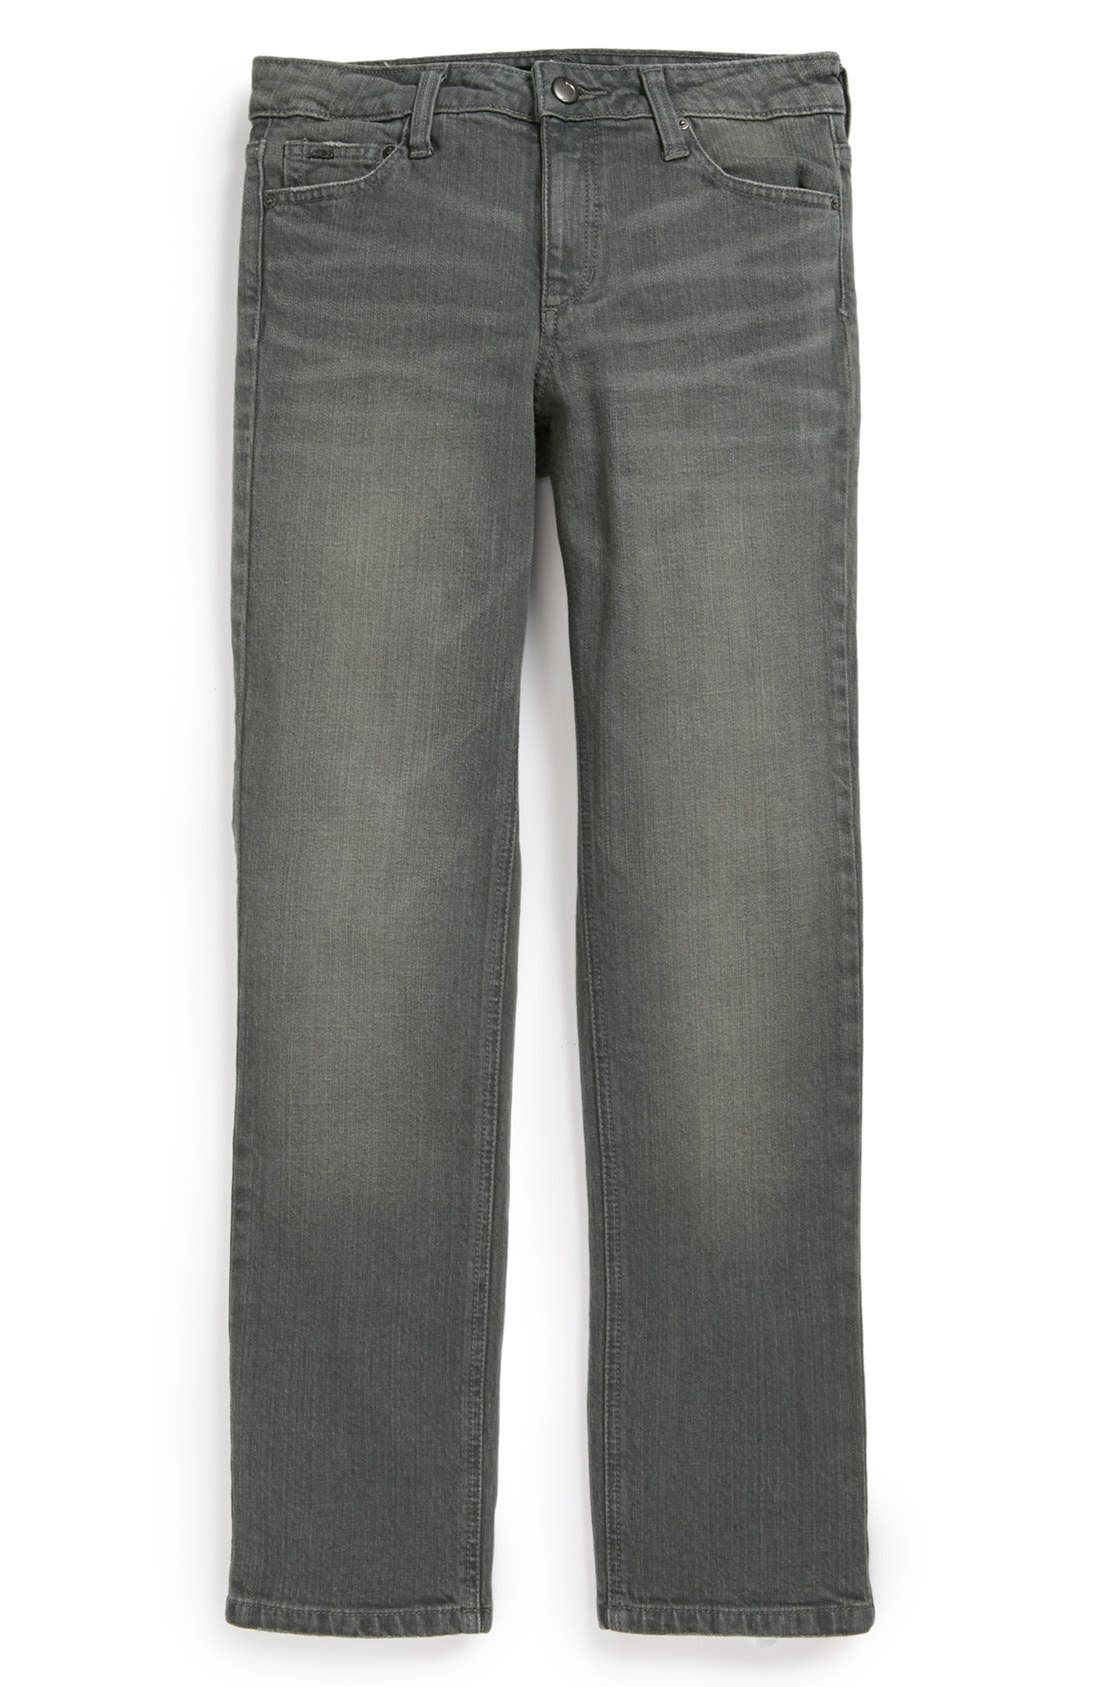 Alternate Image 2  - Joe's 'The Rad' Skinny Fit Jeans (Big Boys & Little Boys)